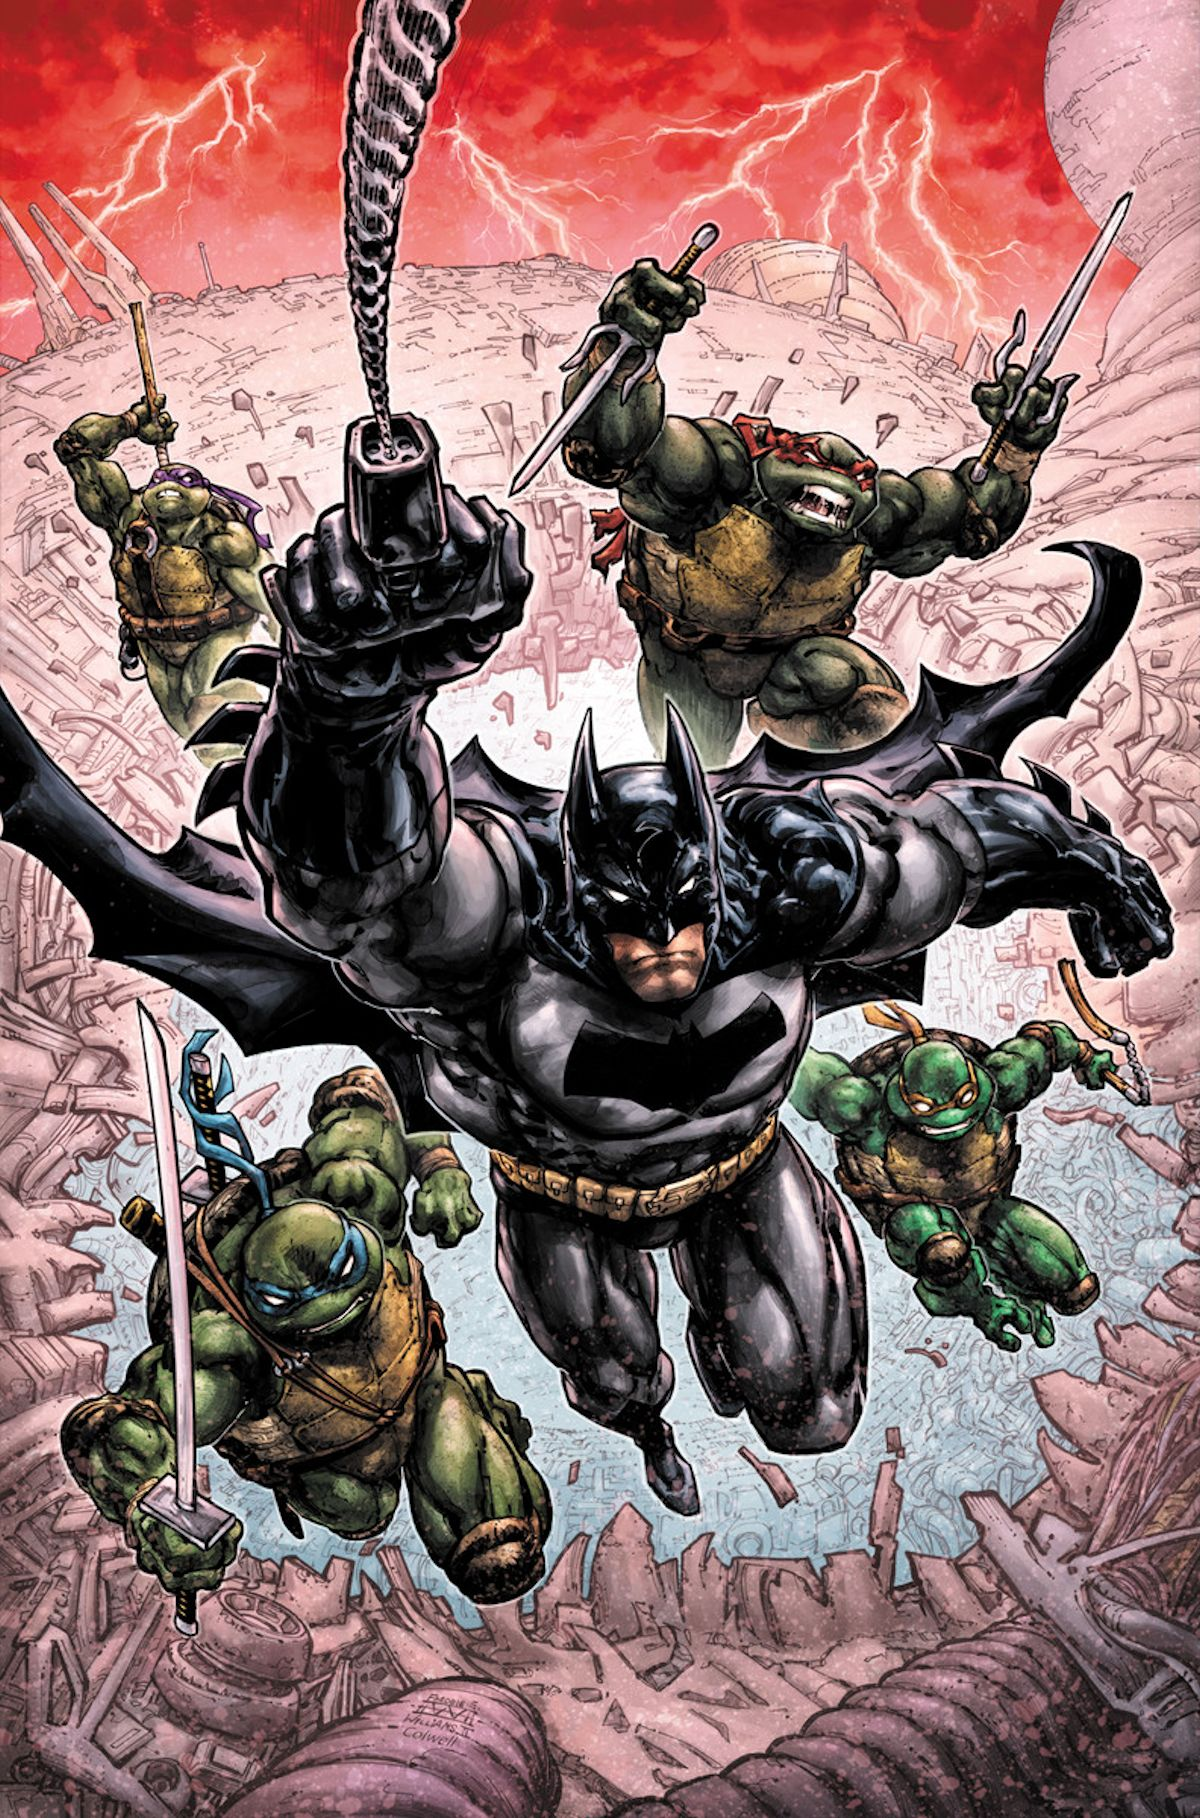 Batman Teenage Mutant Ninja Turtles III